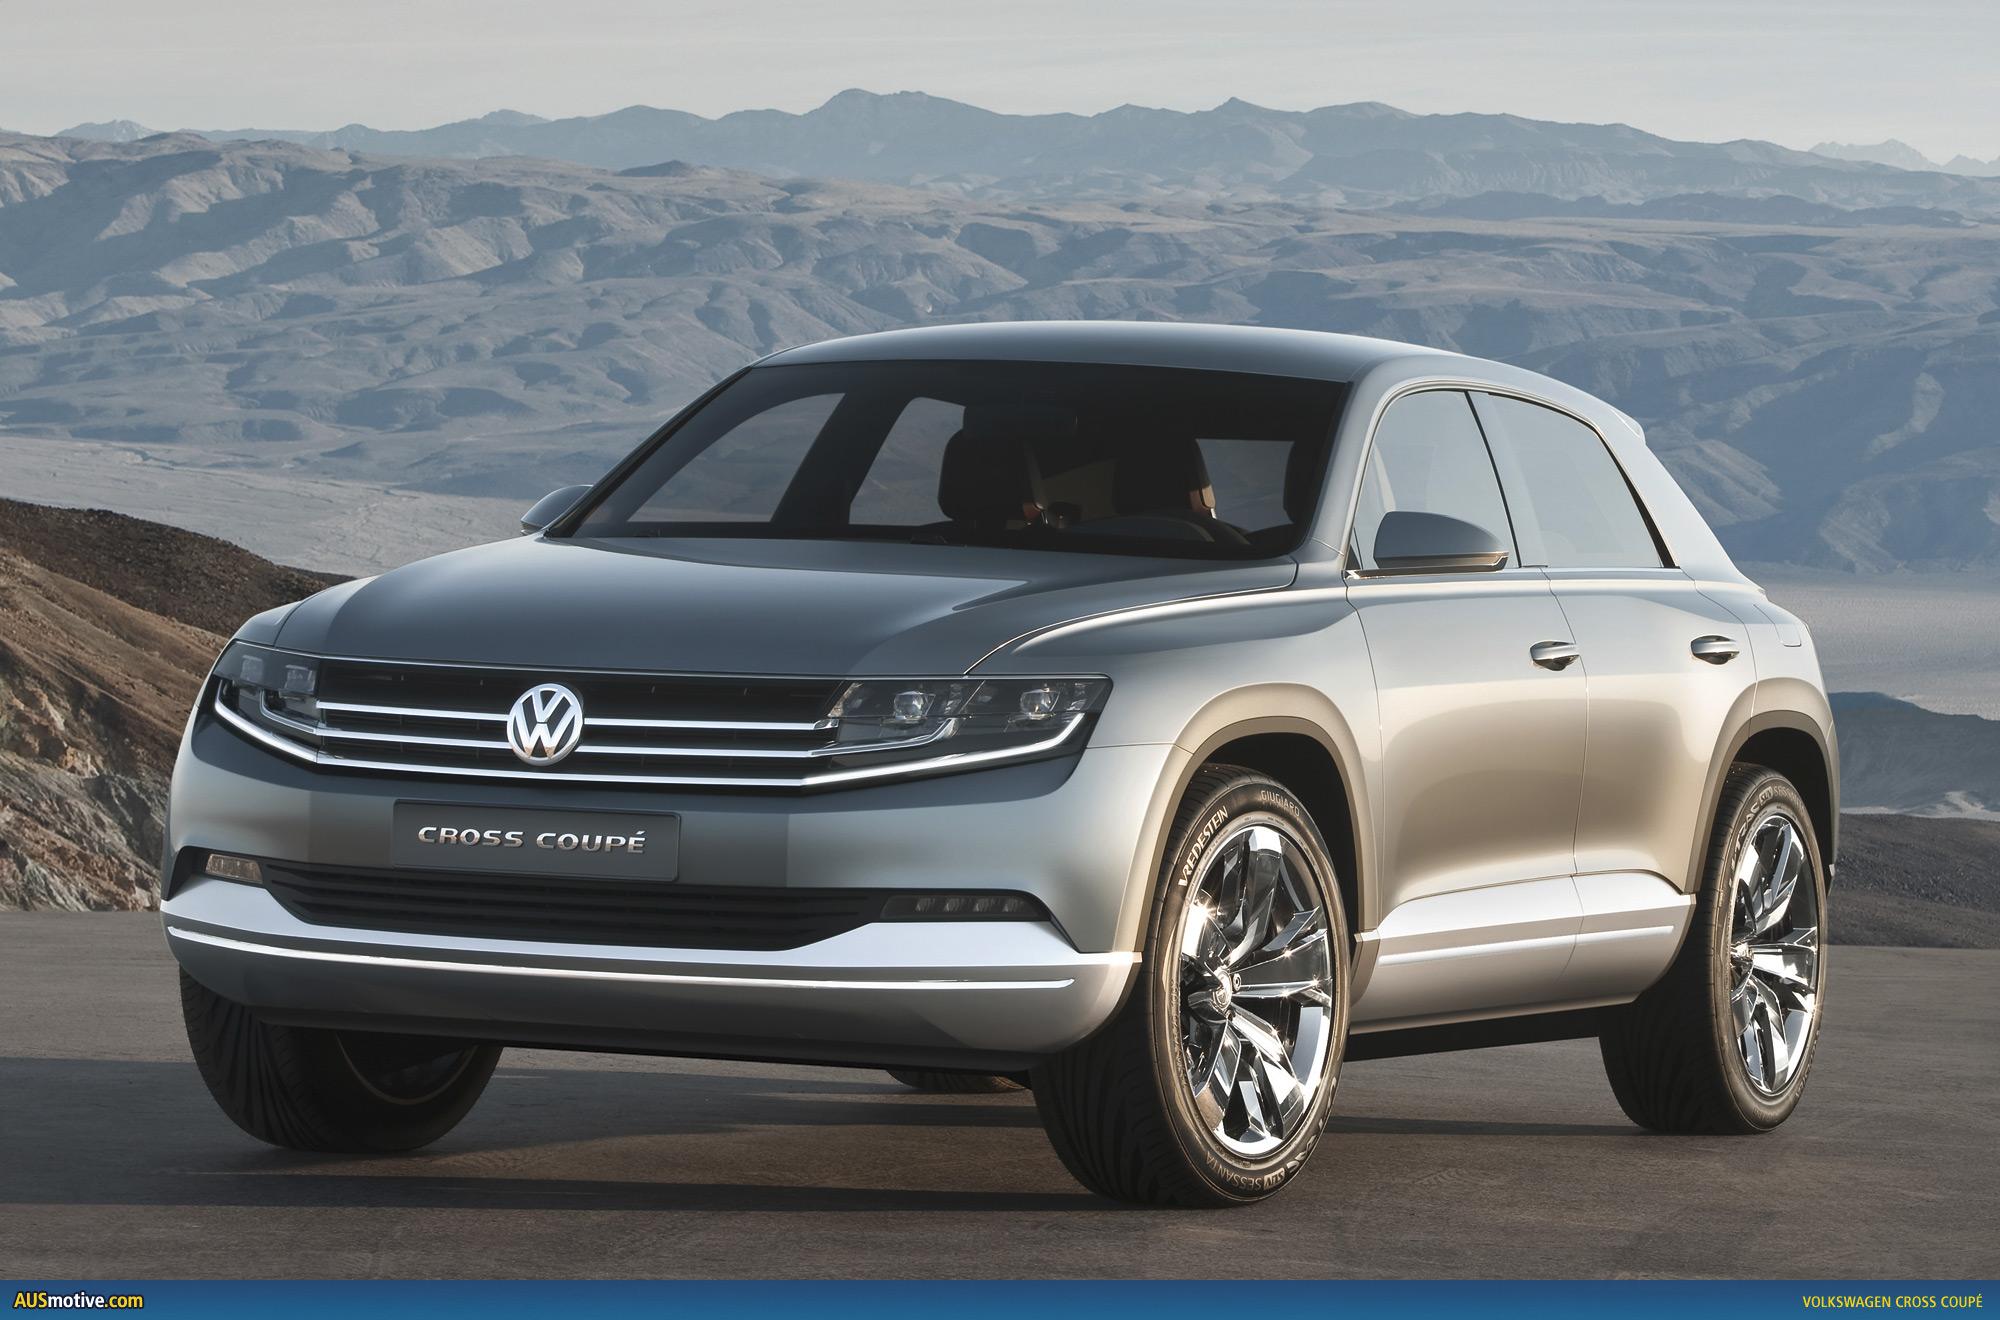 Vw Tiguan Coupe 2018 >> AUSmotive.com » Tokyo 2011: Volkswagen Cross Coupé